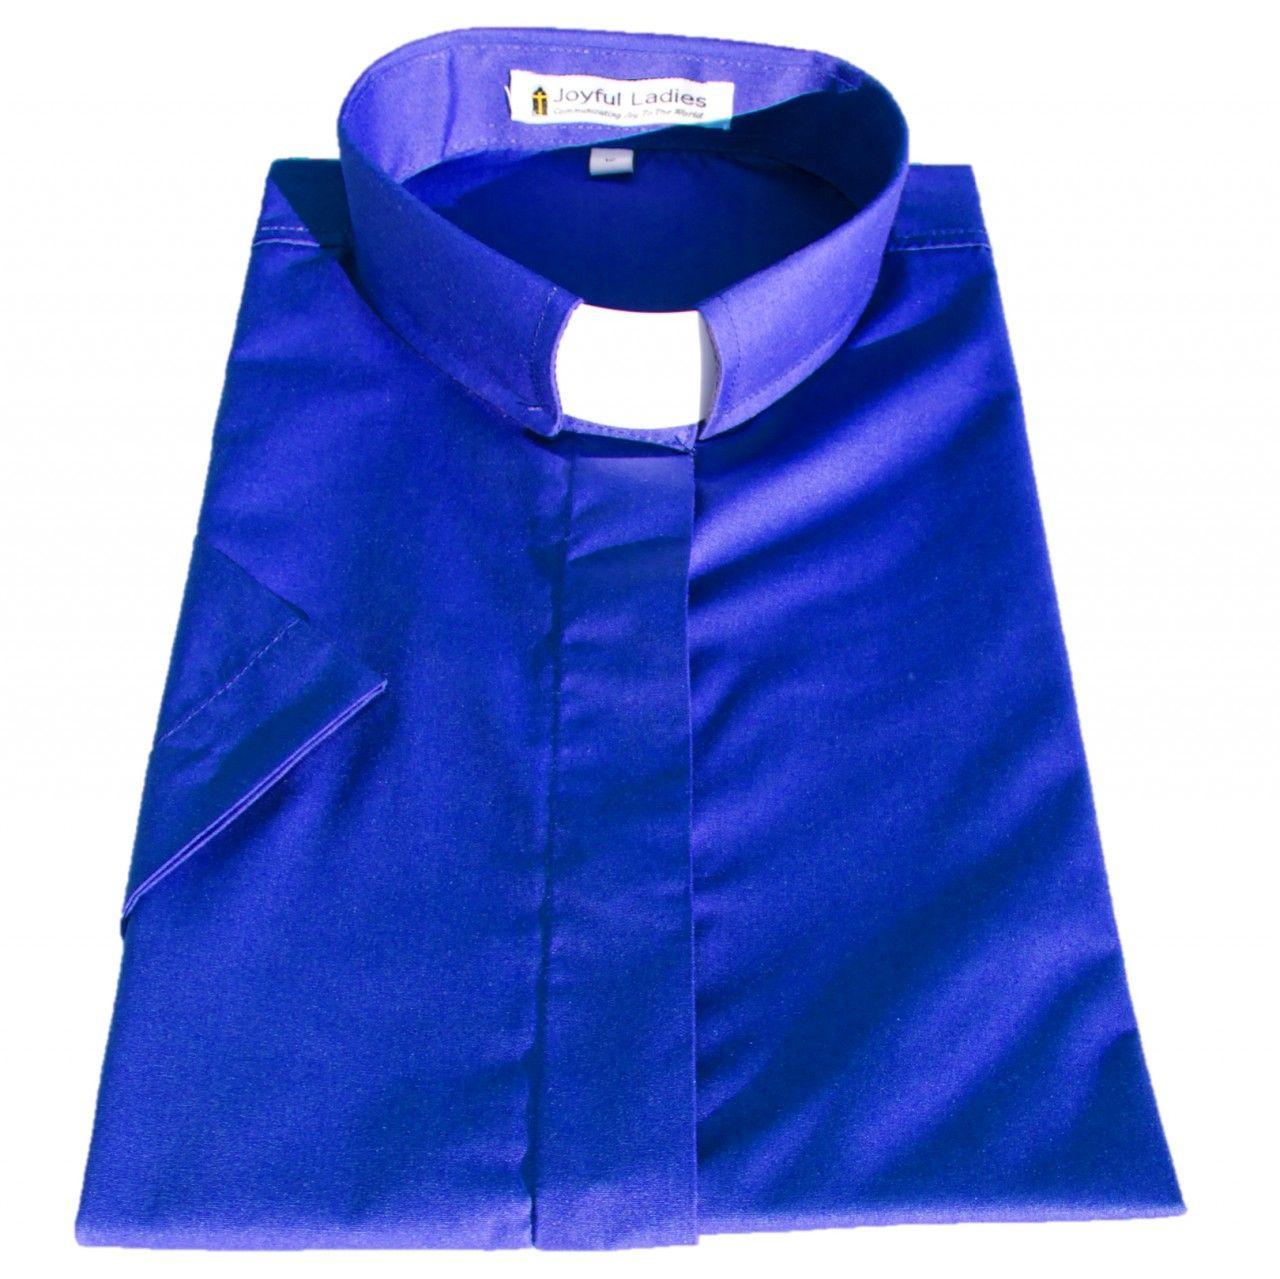 571. Women's Short-Sleeve Tab-Collar Clergy Shirt - Royal Blue